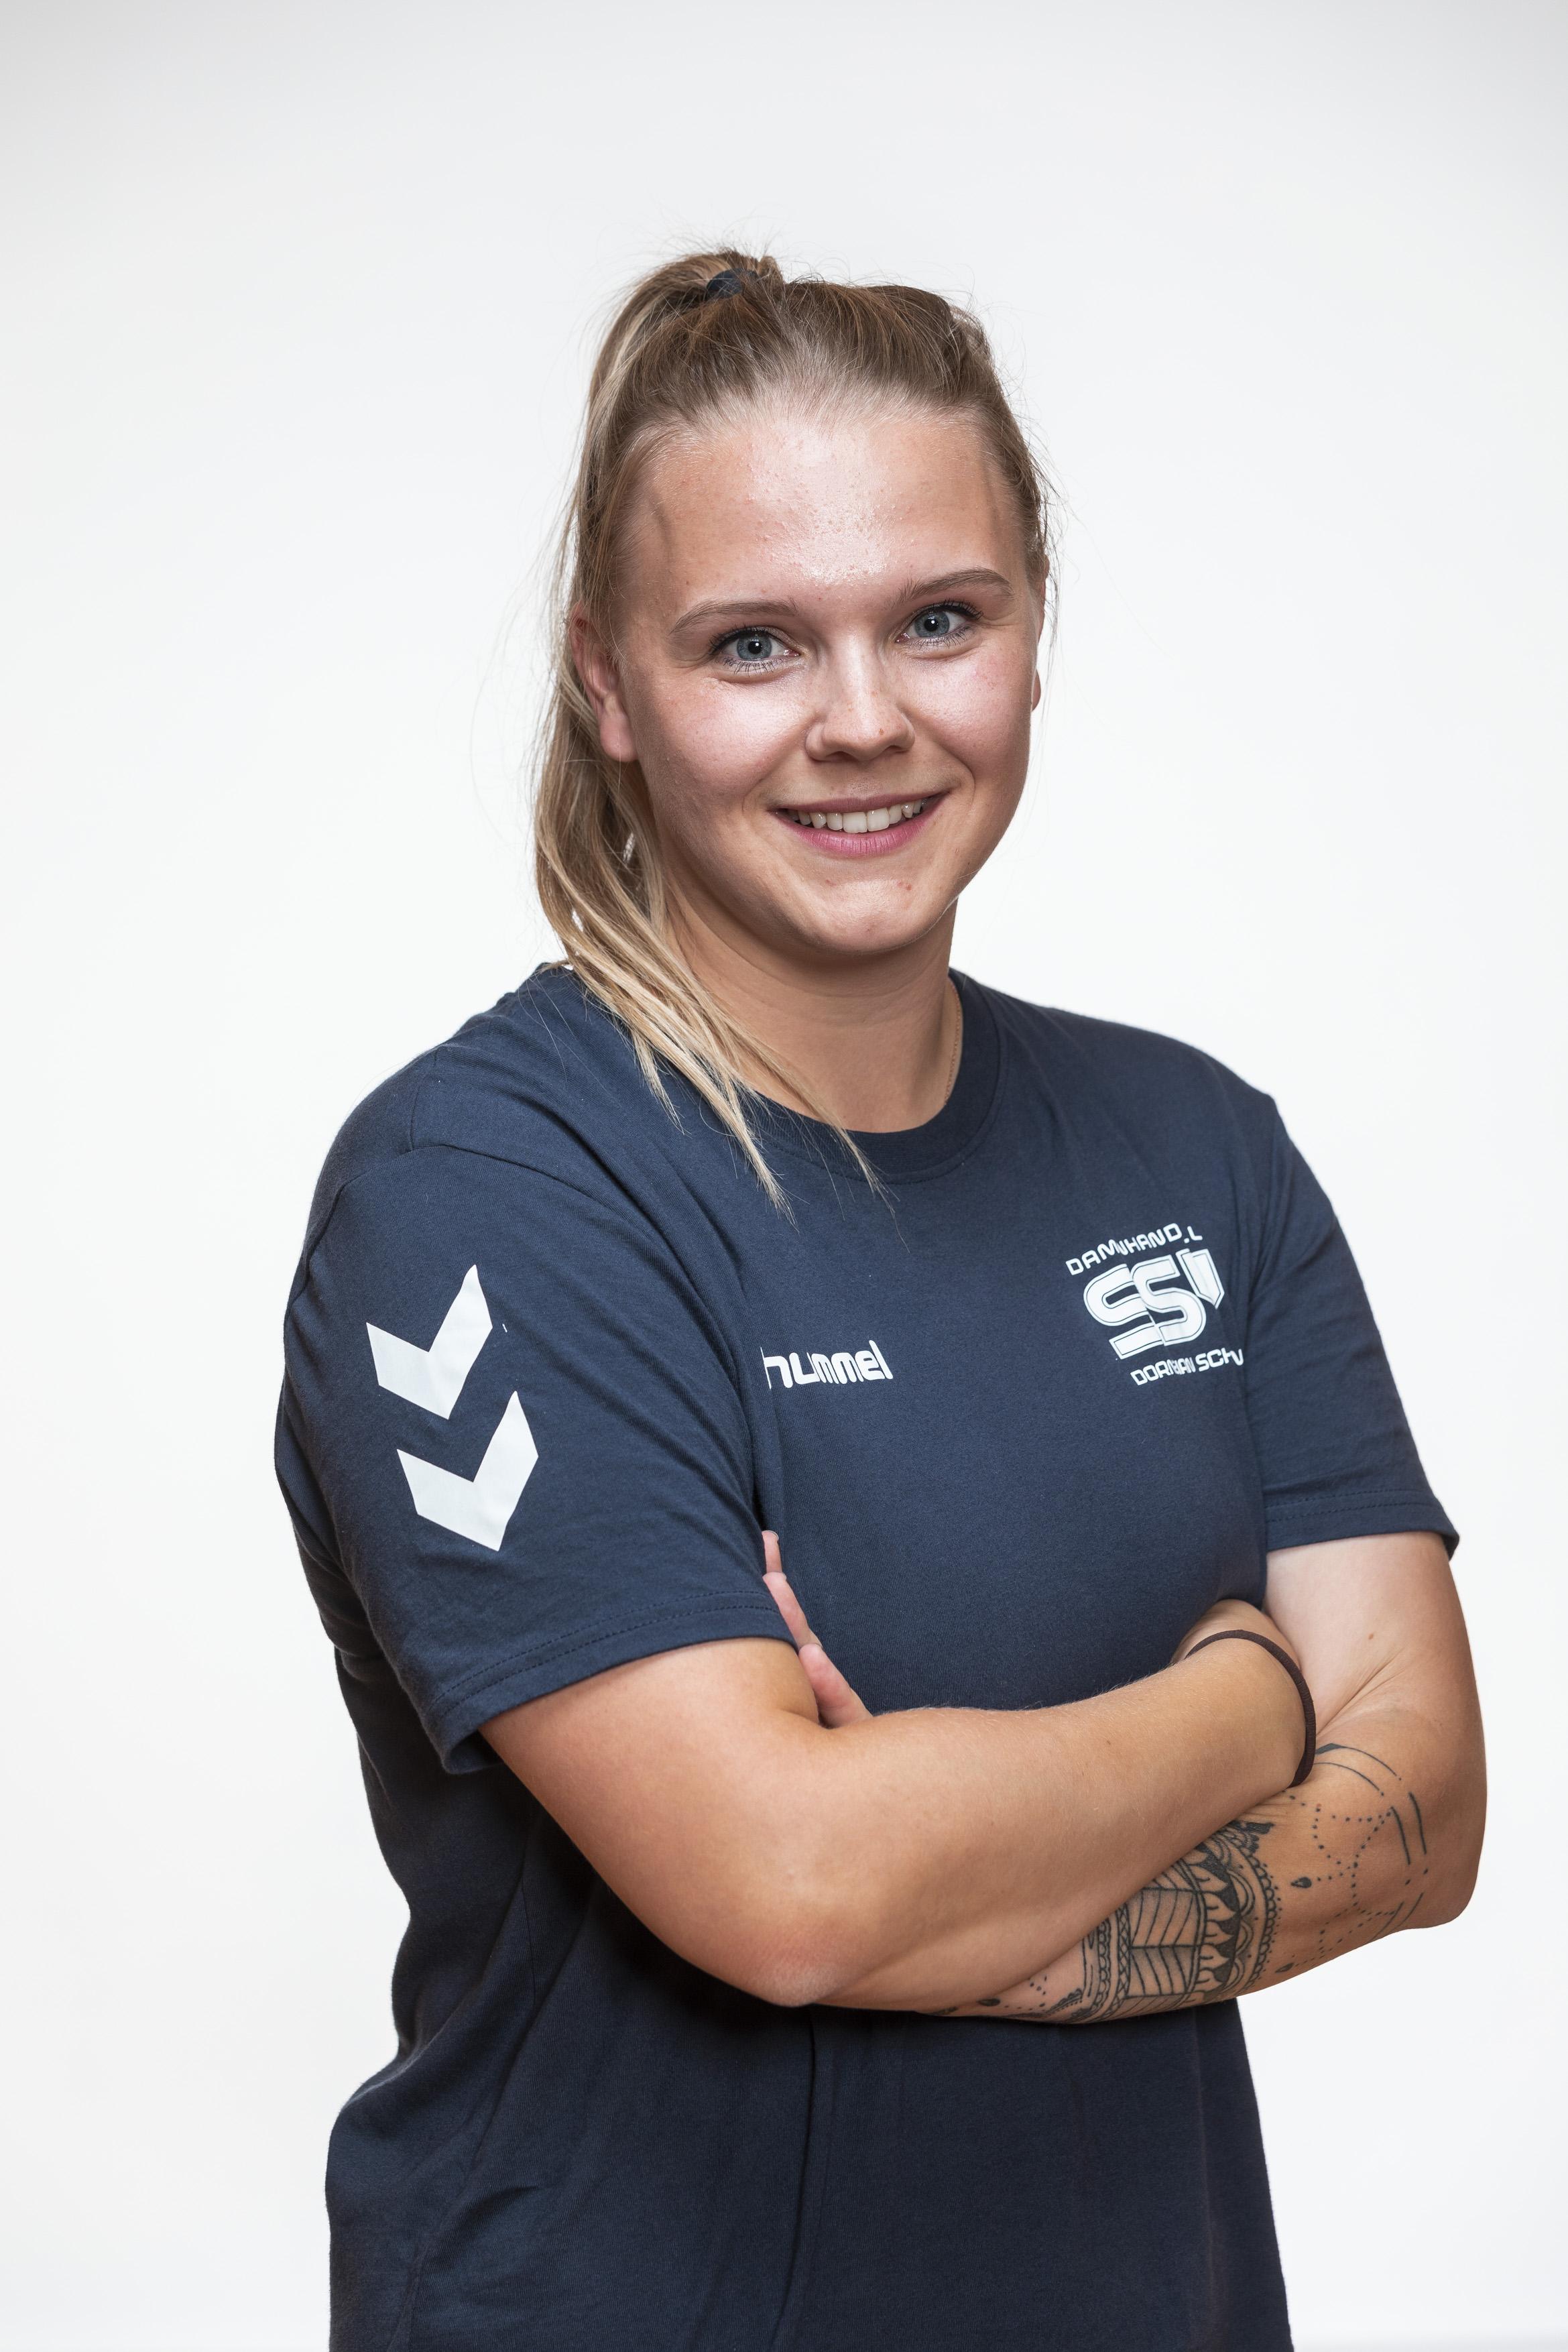 Nadine Ehgarter